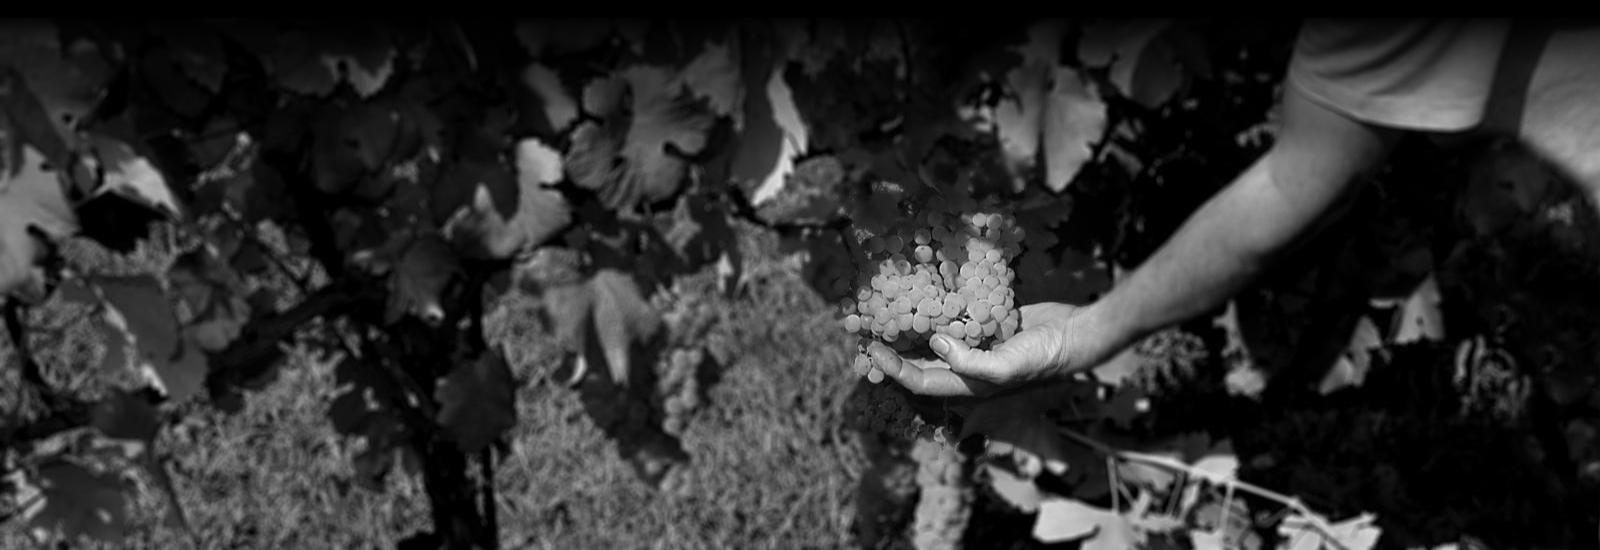 Produzione vini a Castel San Pietro Terme